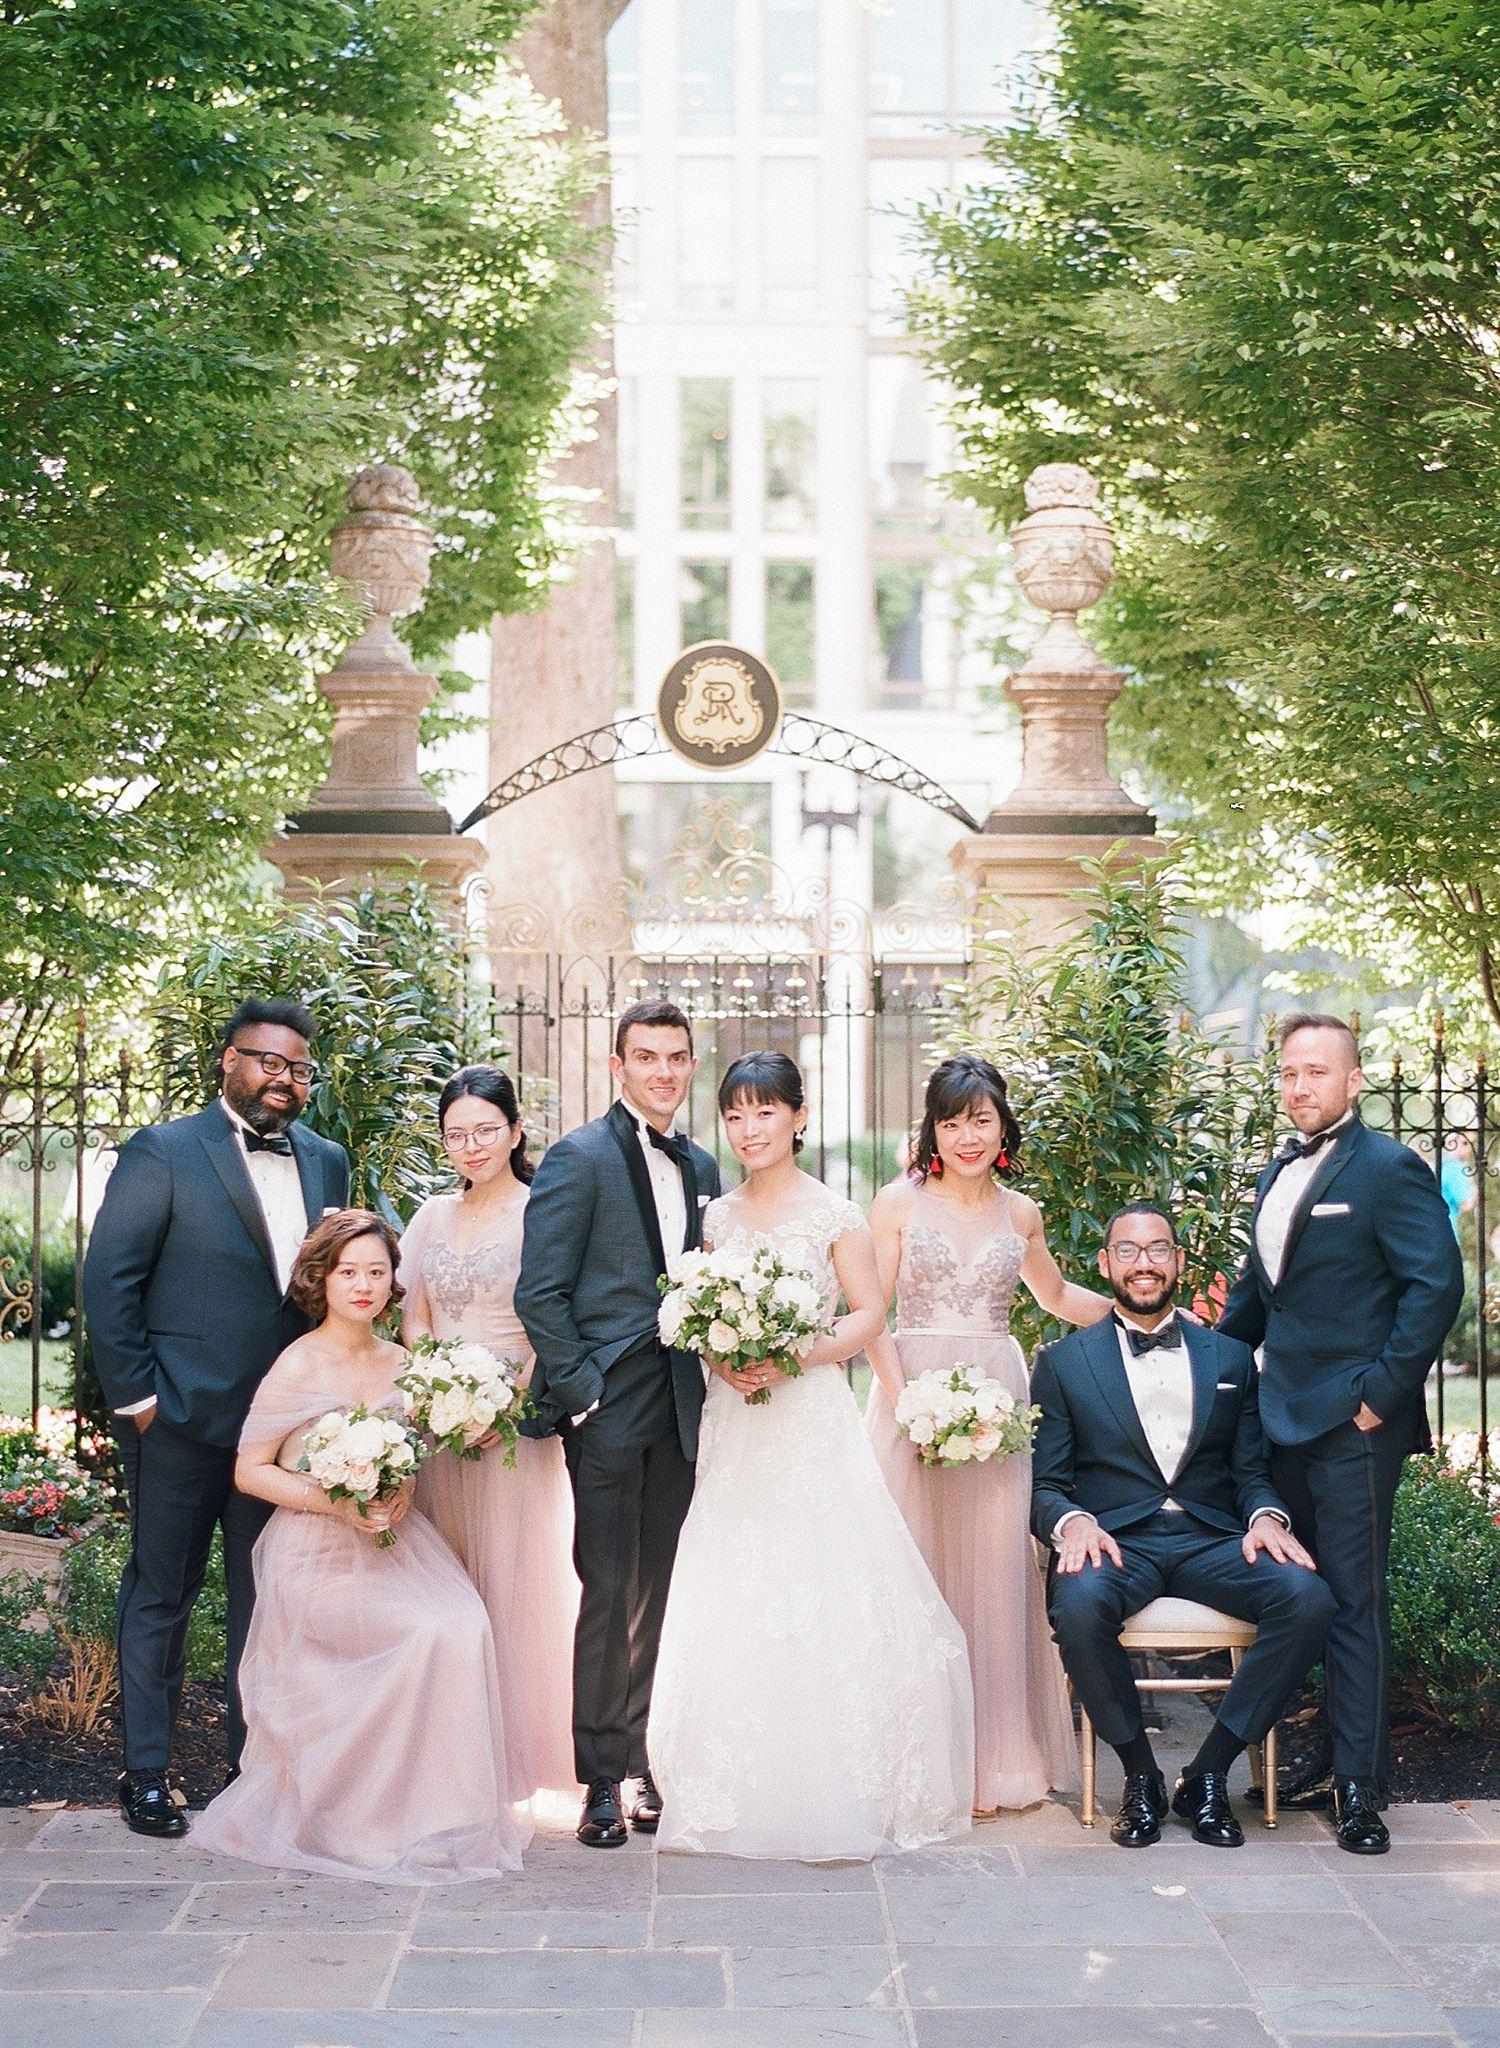 St. Regis DC wedding party photos